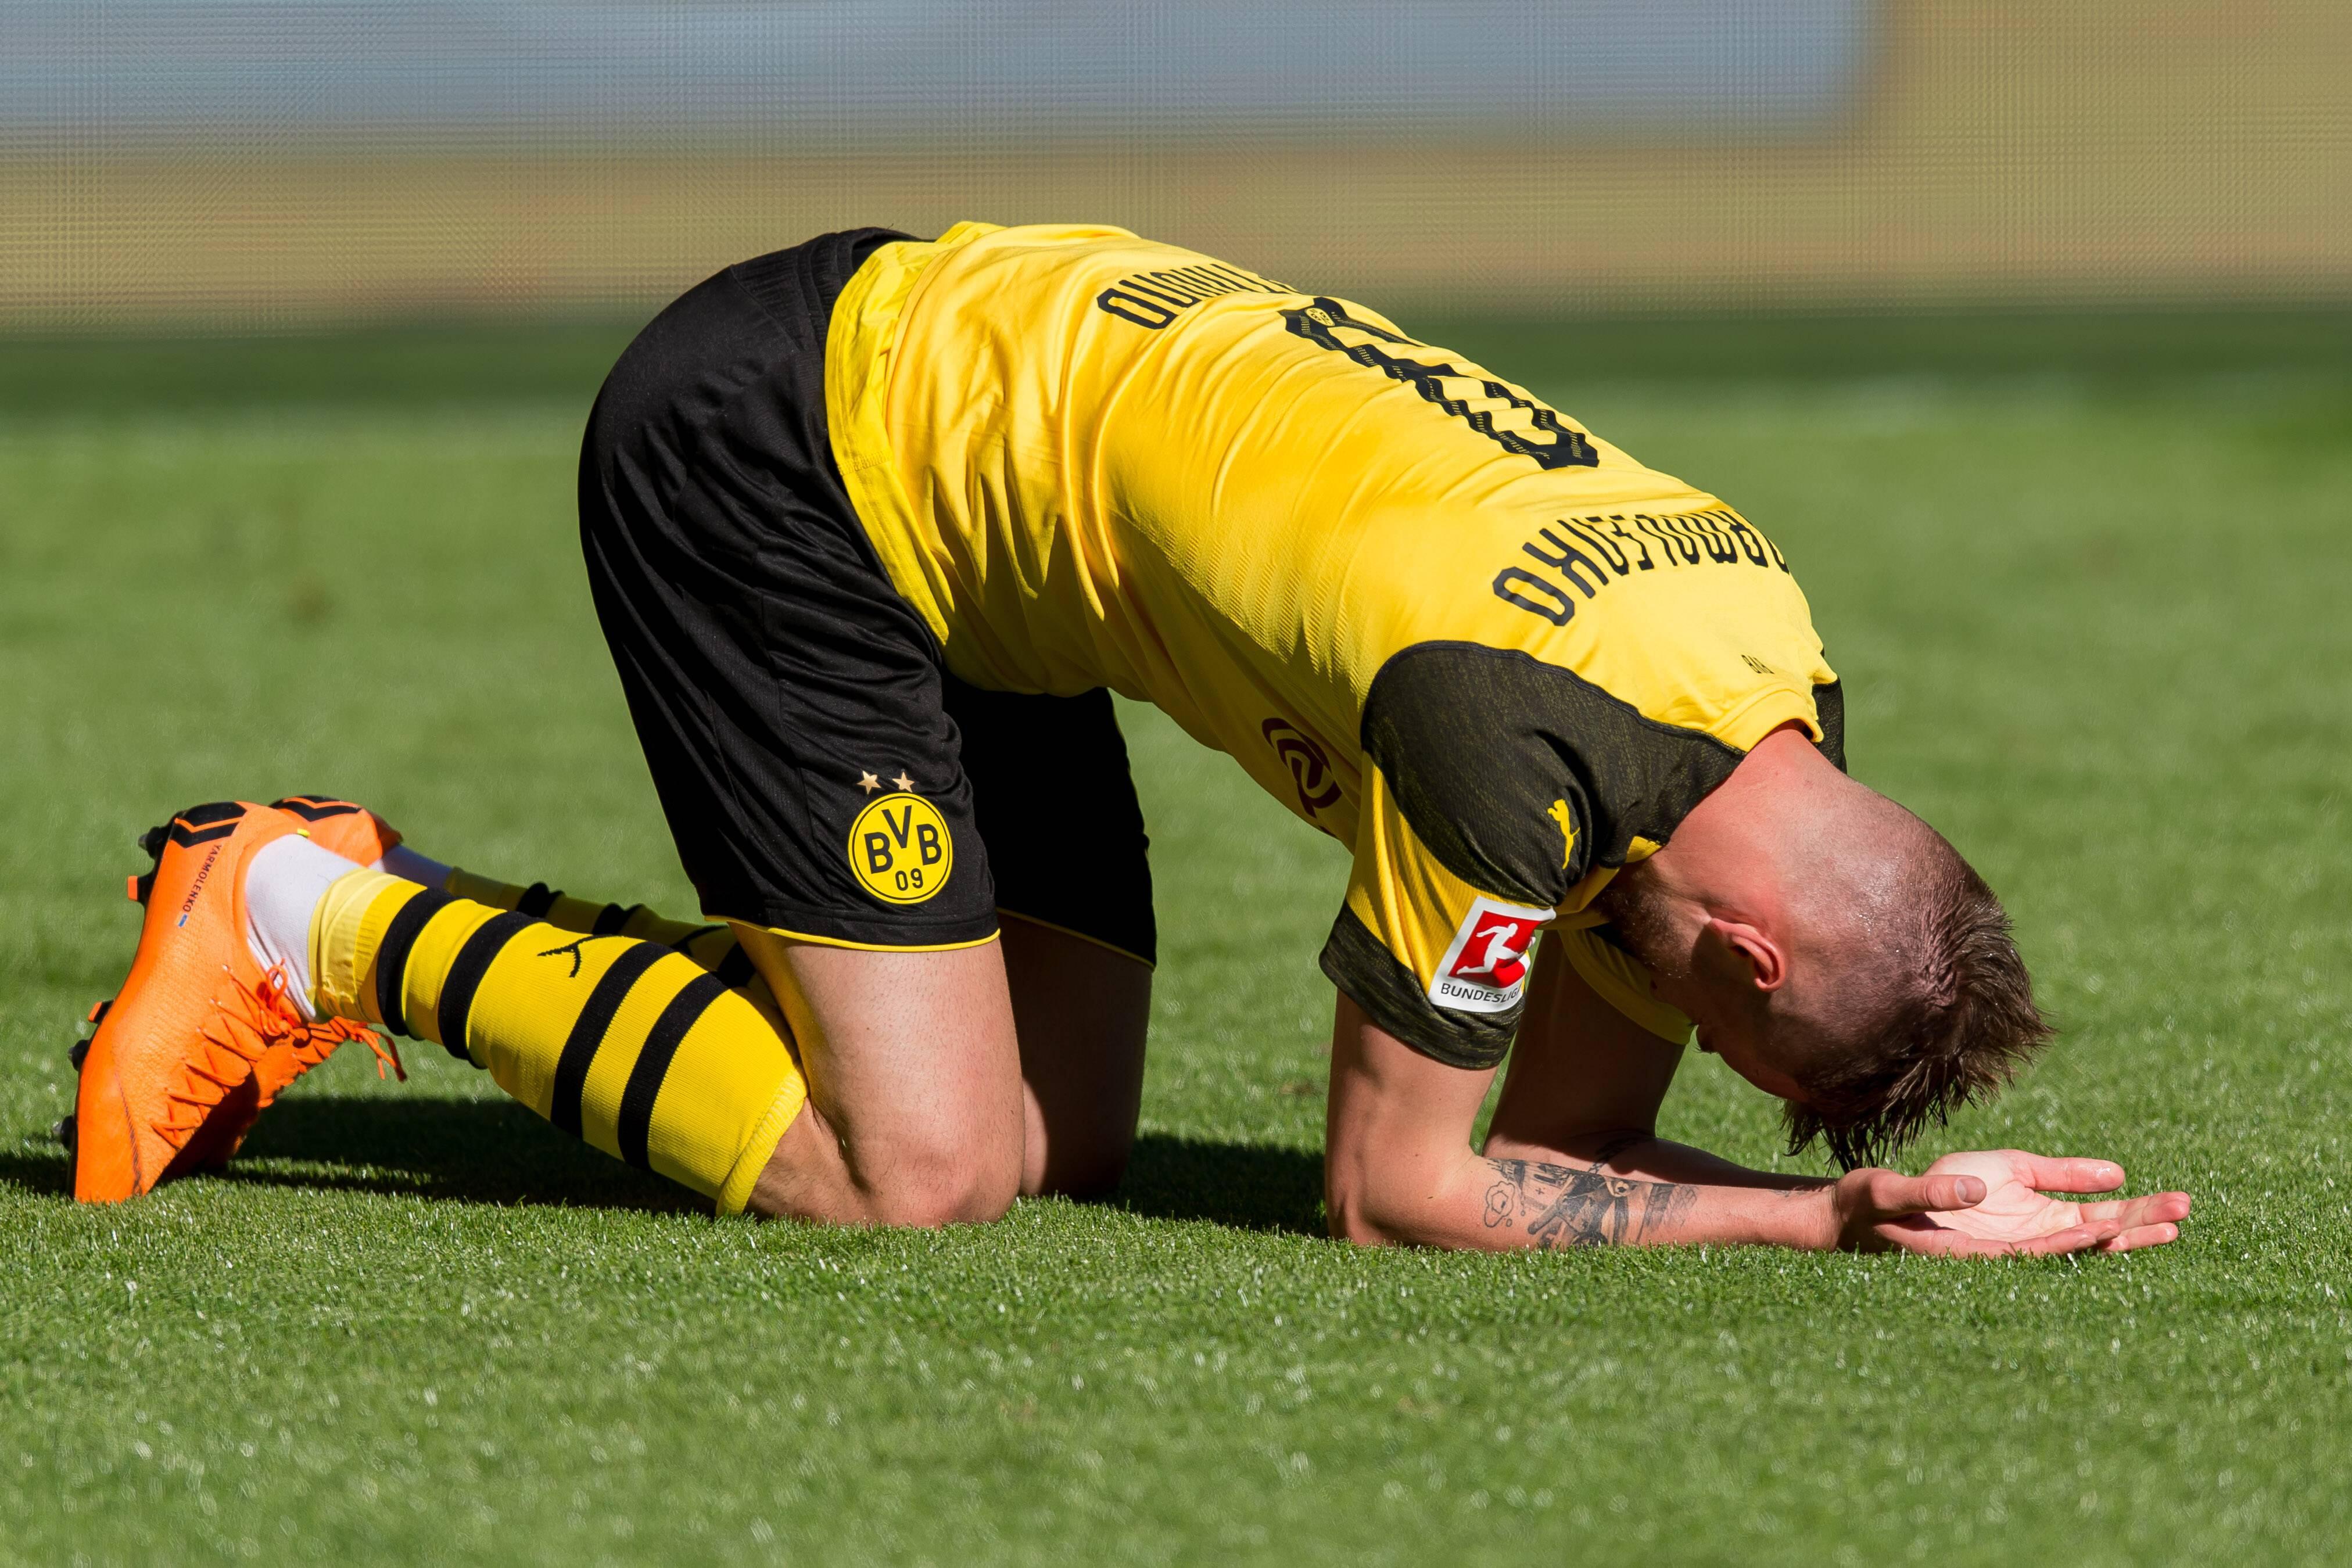 Bild zu Borussia Dortmund, BVB, Bundesliga, Krise